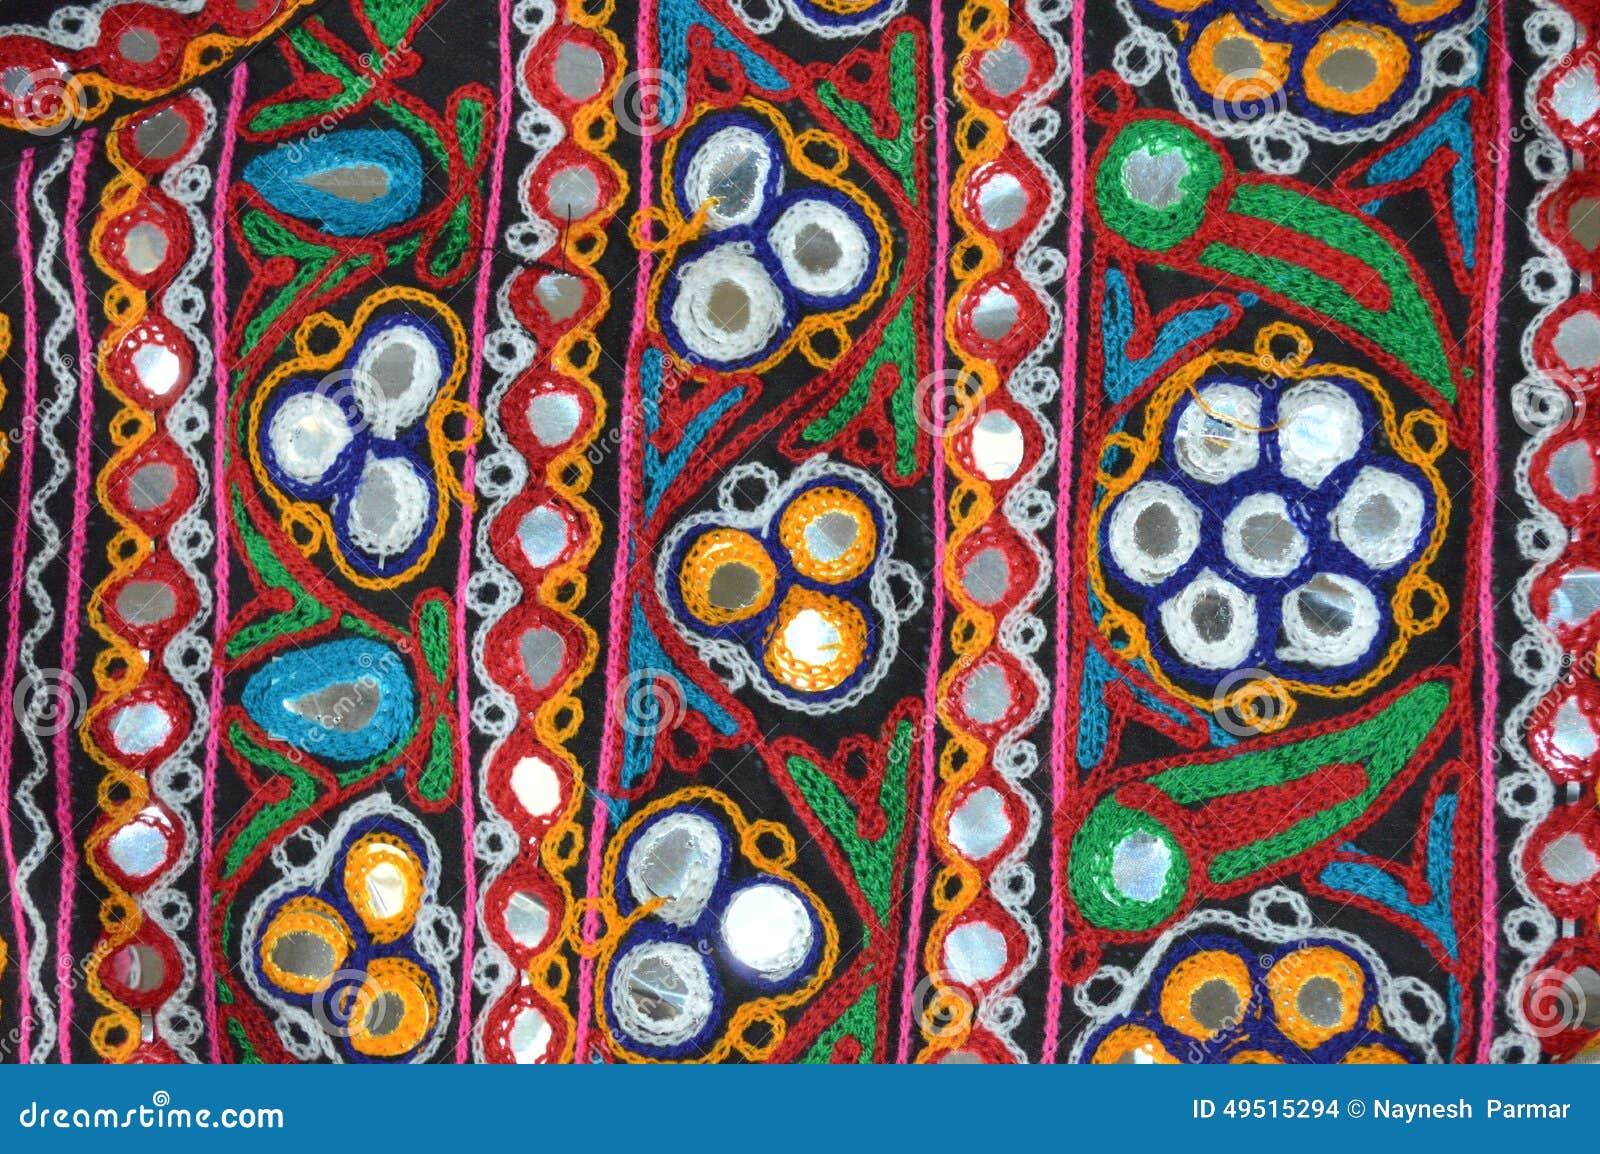 Kutchi embroidery work stock photo image